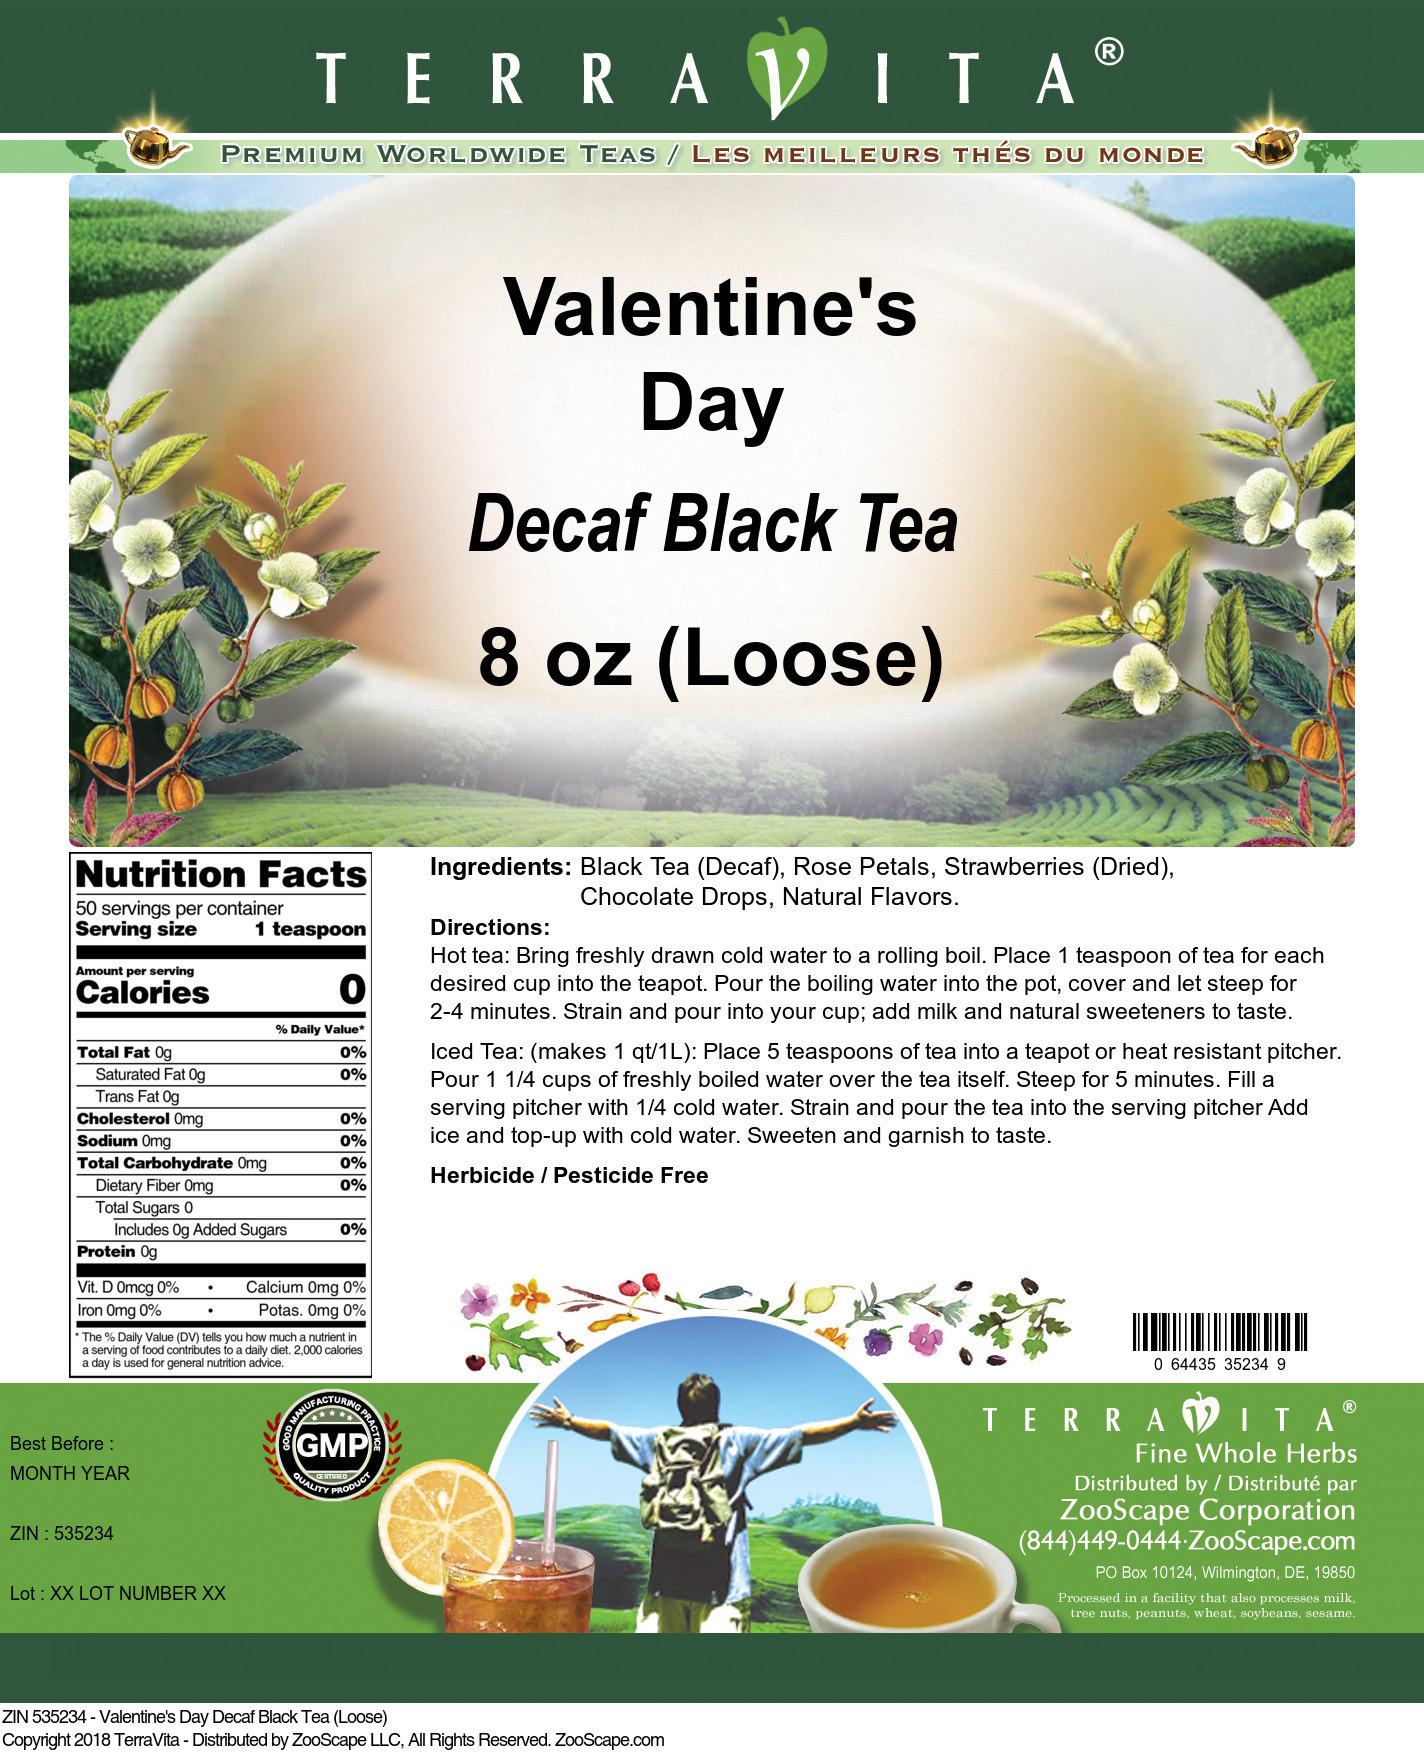 Valentine's Day Decaf Black Tea